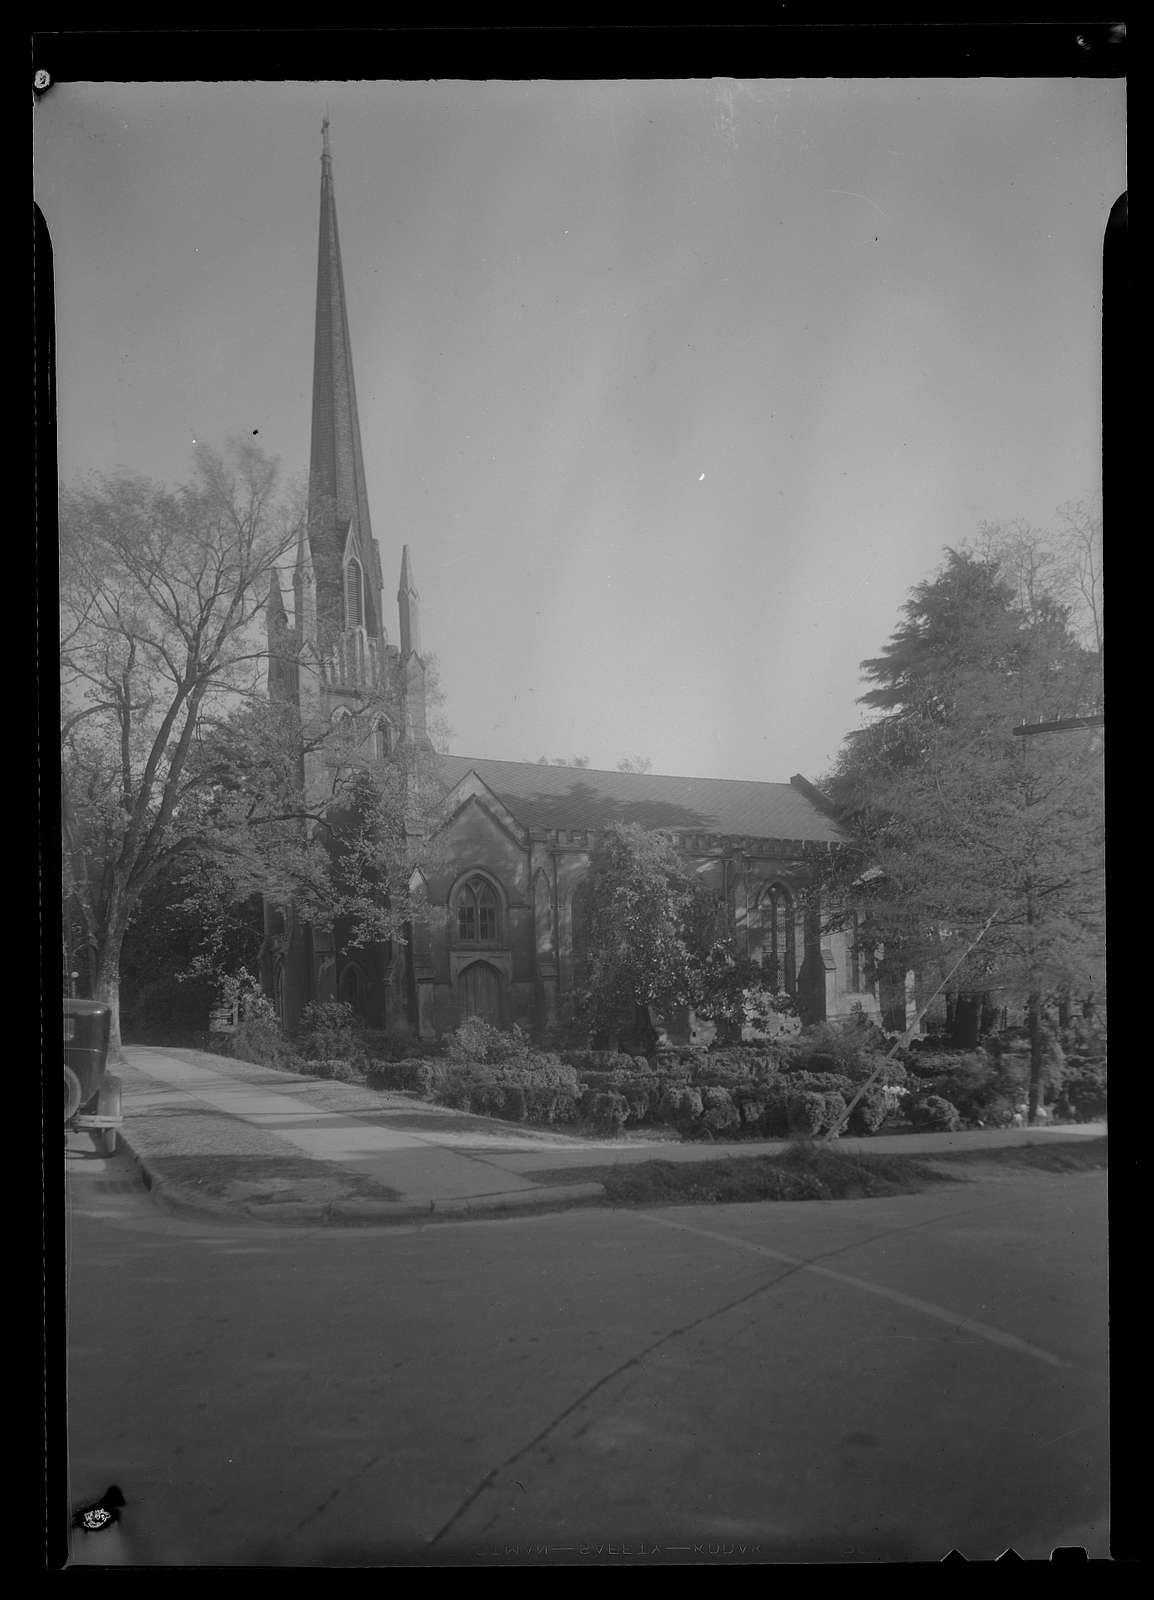 Trinity Episcopal Church, Church Street, Abbeville, Abbeville County, SC